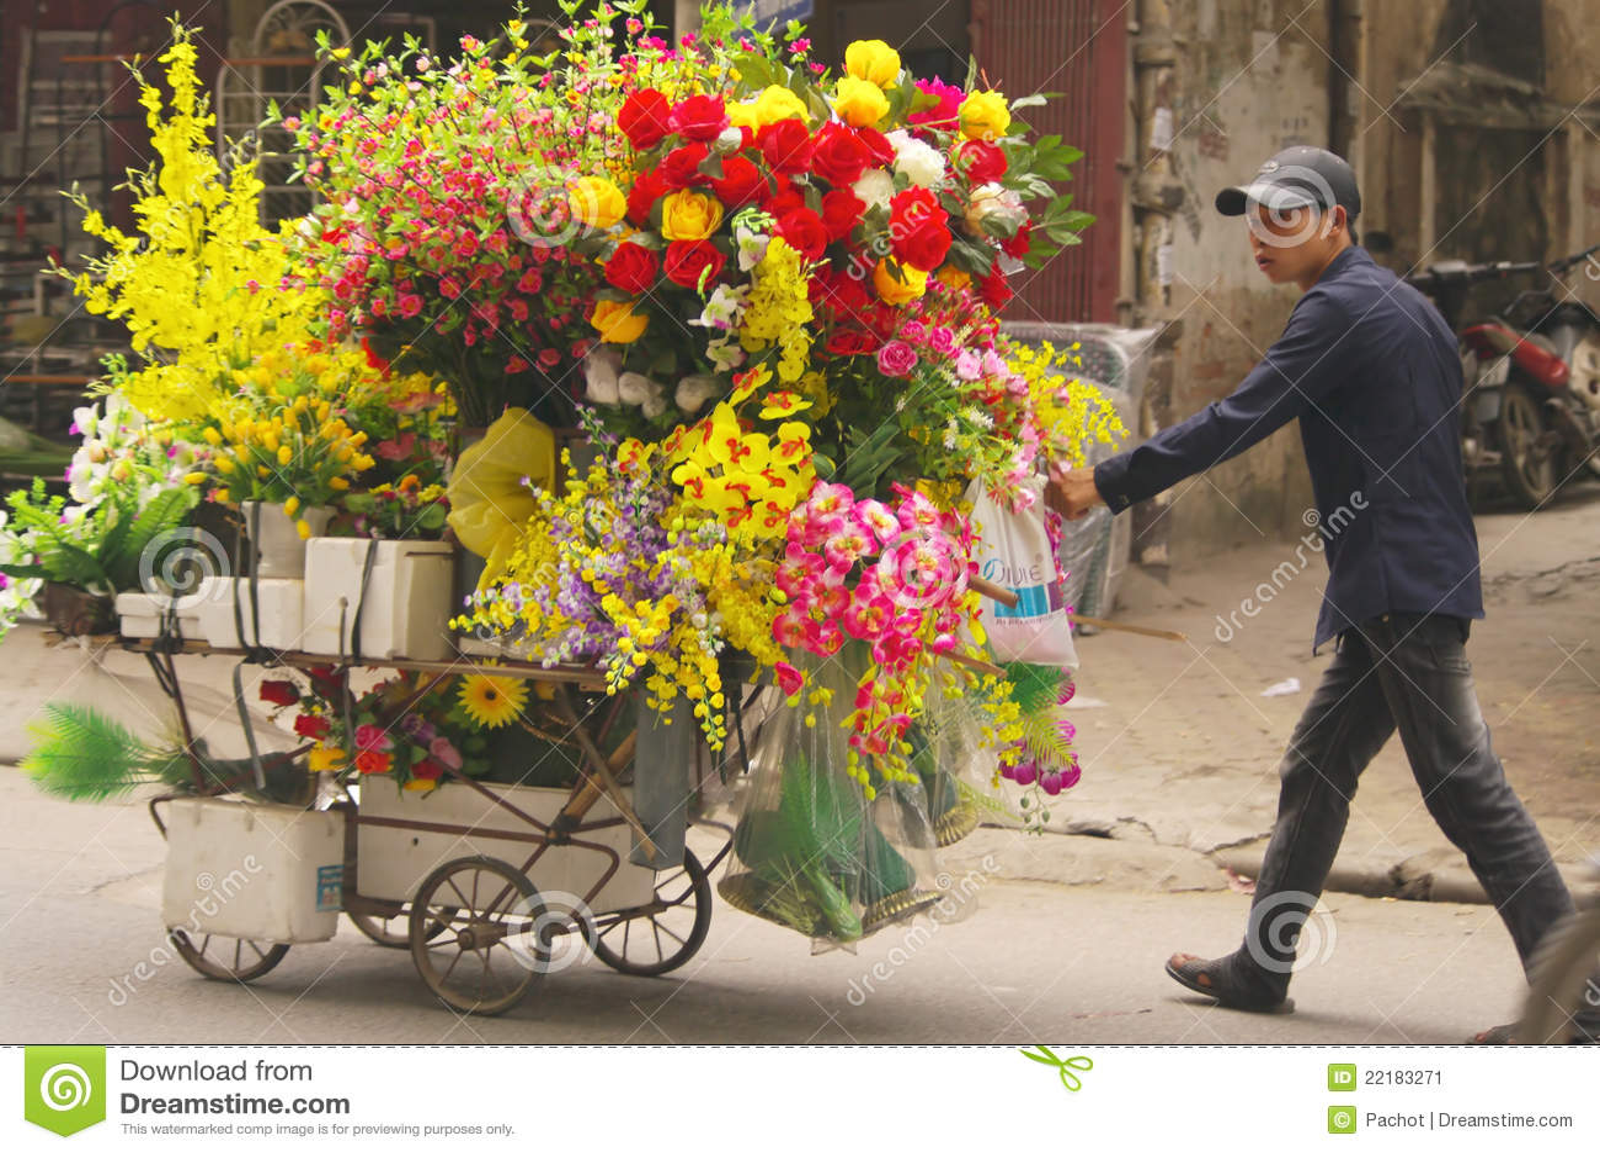 Flowers clipart garden, Flowers garden Transparent FREE for download on  WebStockReview 2020